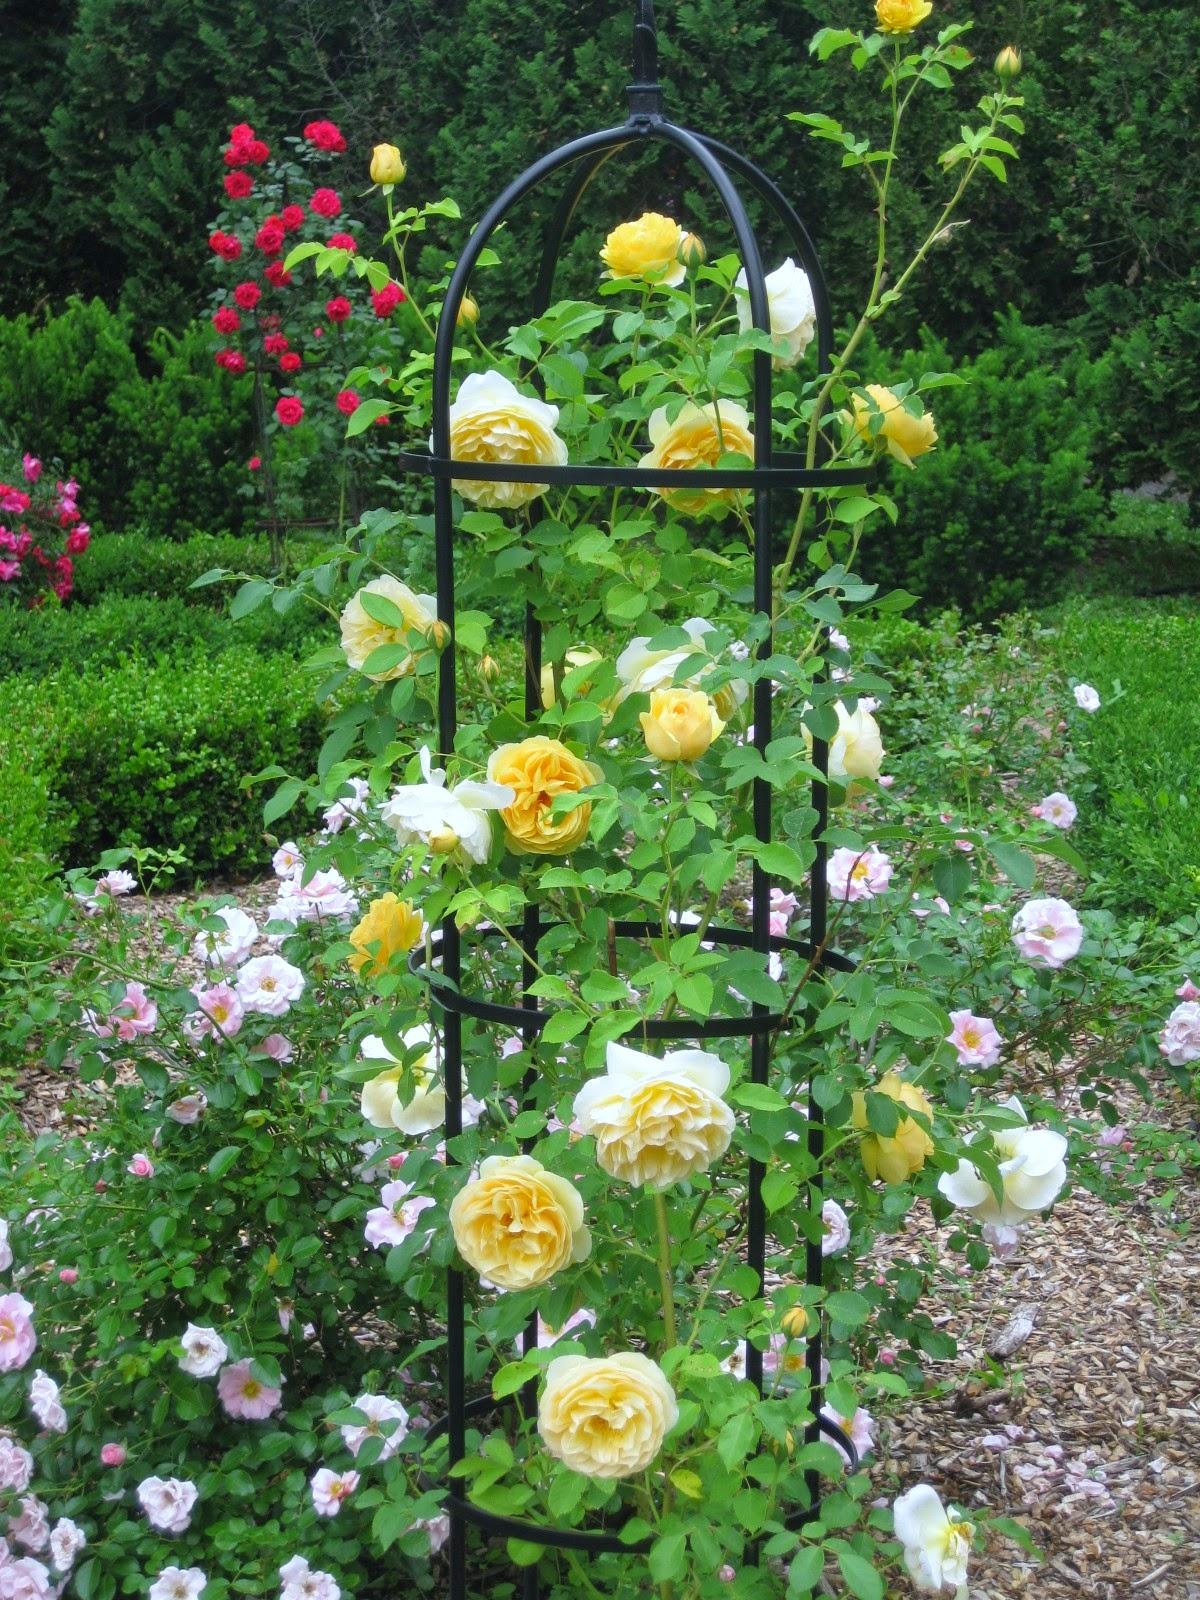 kumaar holidays rose garden munnar. Black Bedroom Furniture Sets. Home Design Ideas